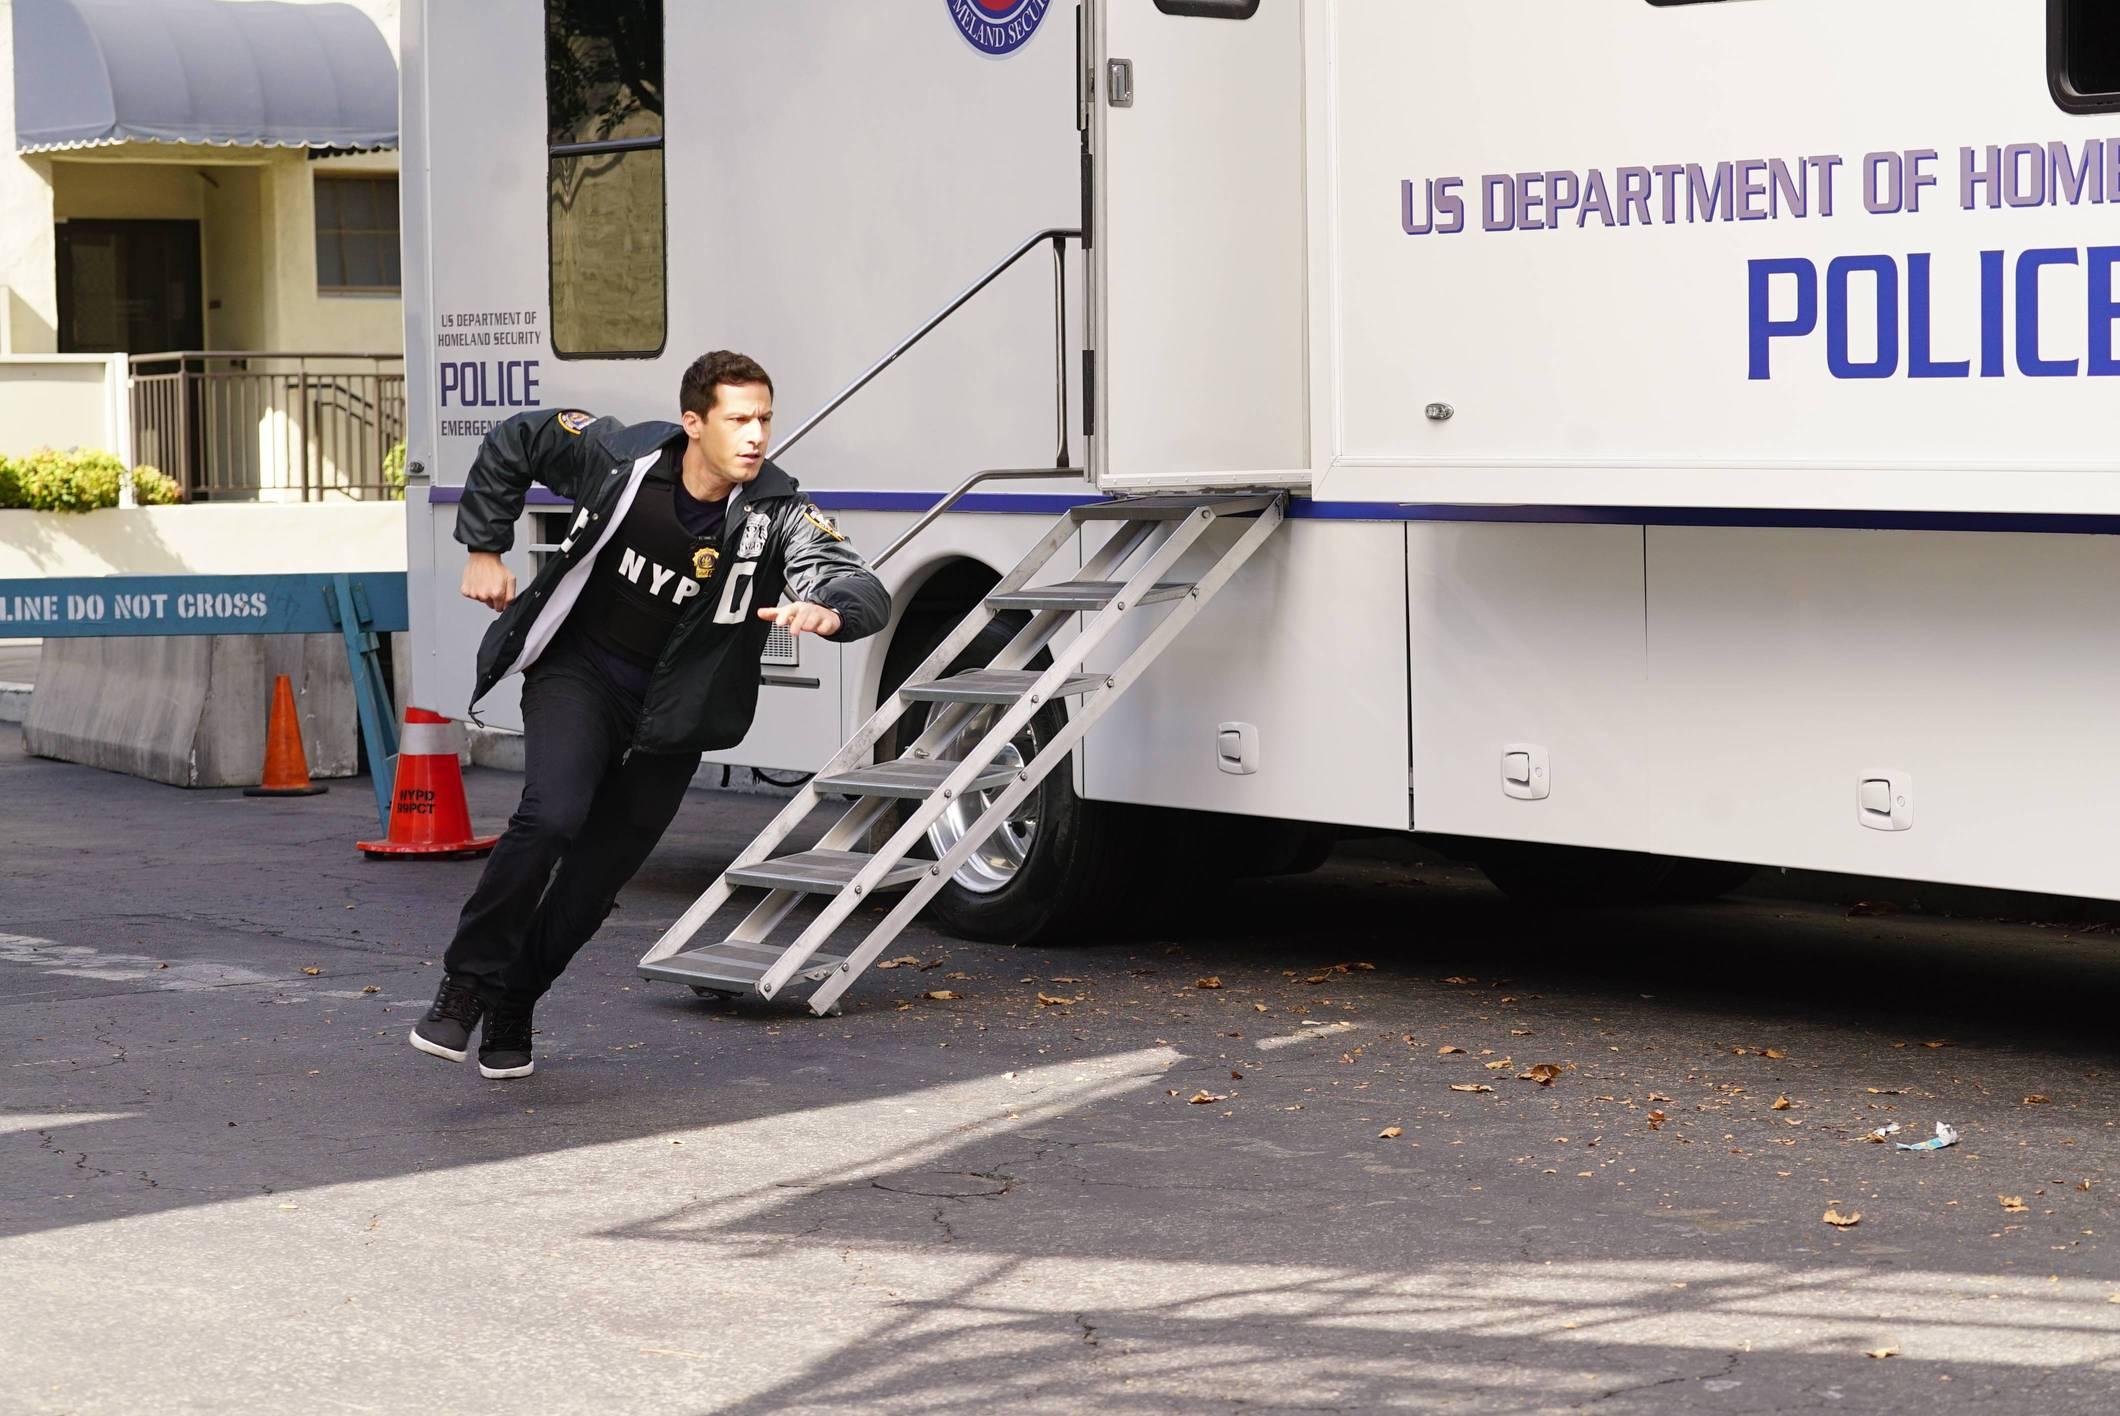 Brooklyn Nine-Nine: The Fugitive, Part 1 | Season 4 | Episode 11